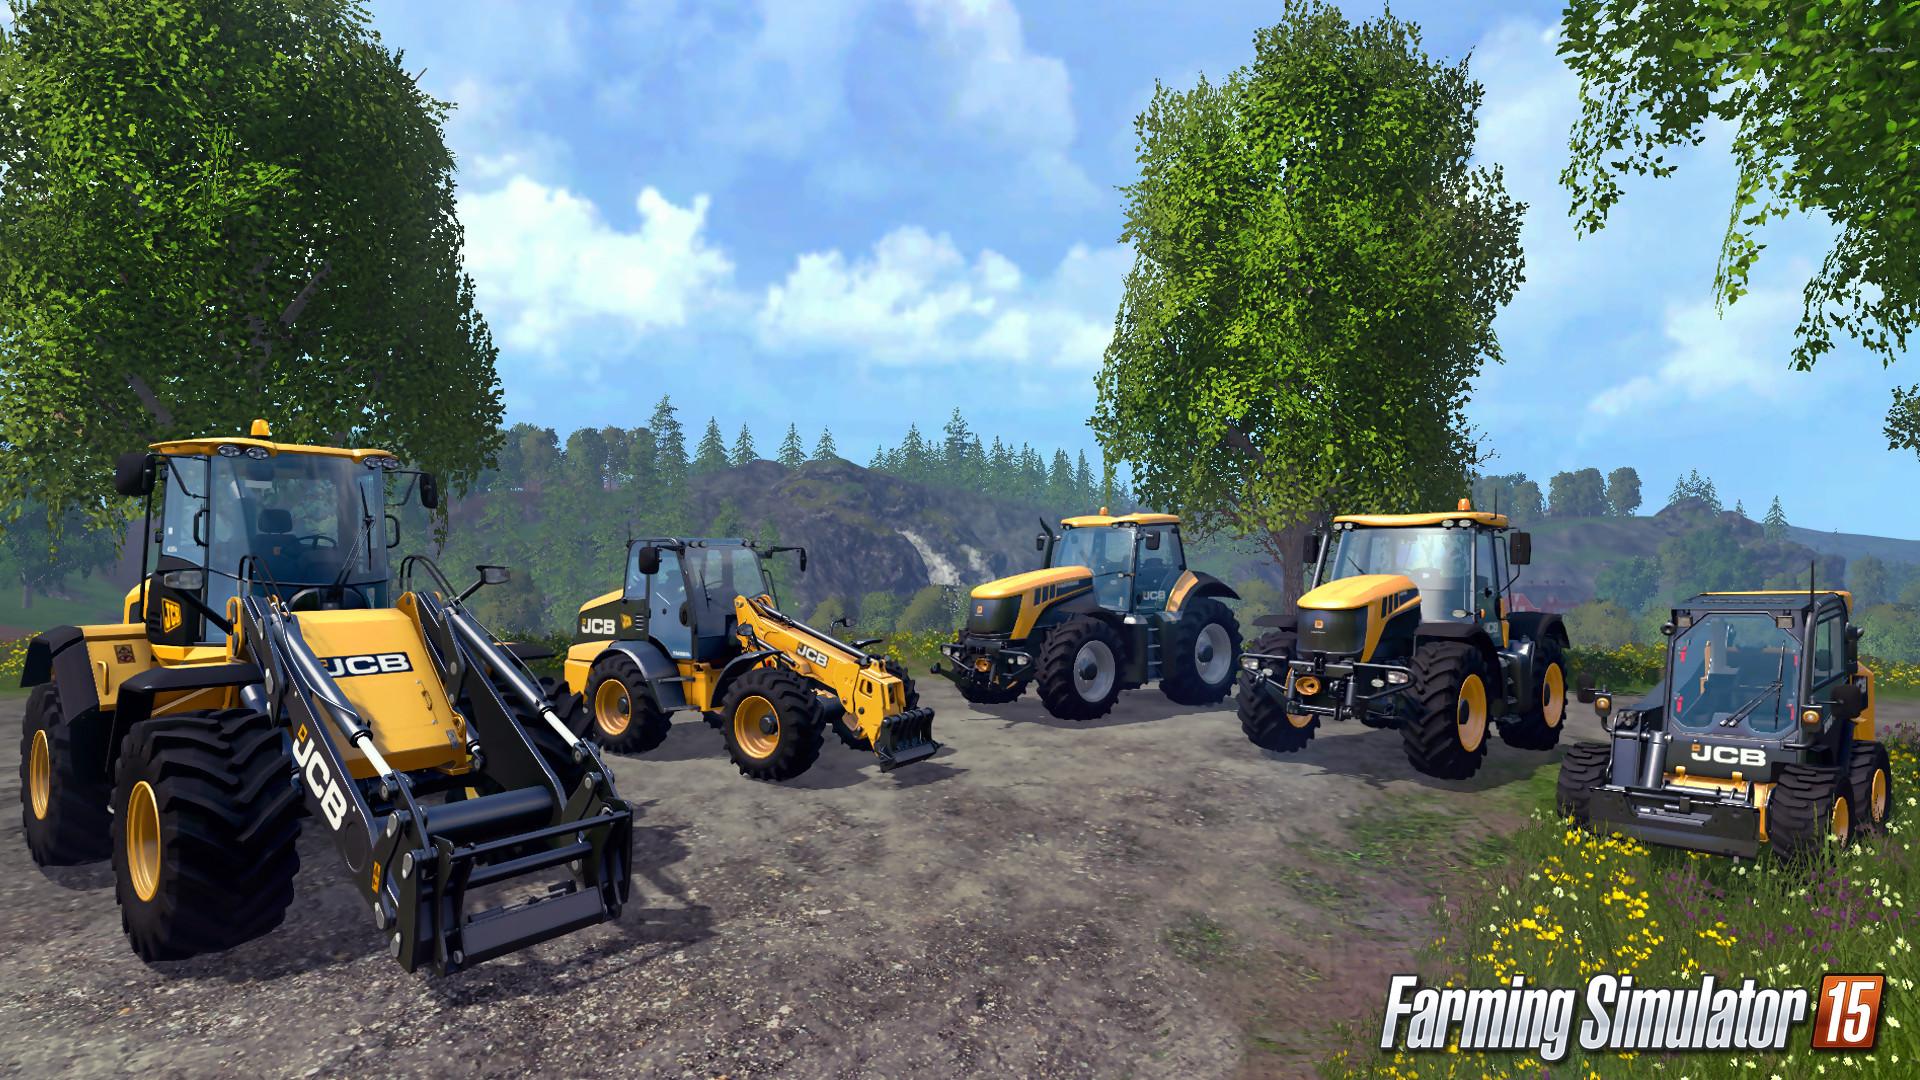 Farming simulator 18 pc requirements